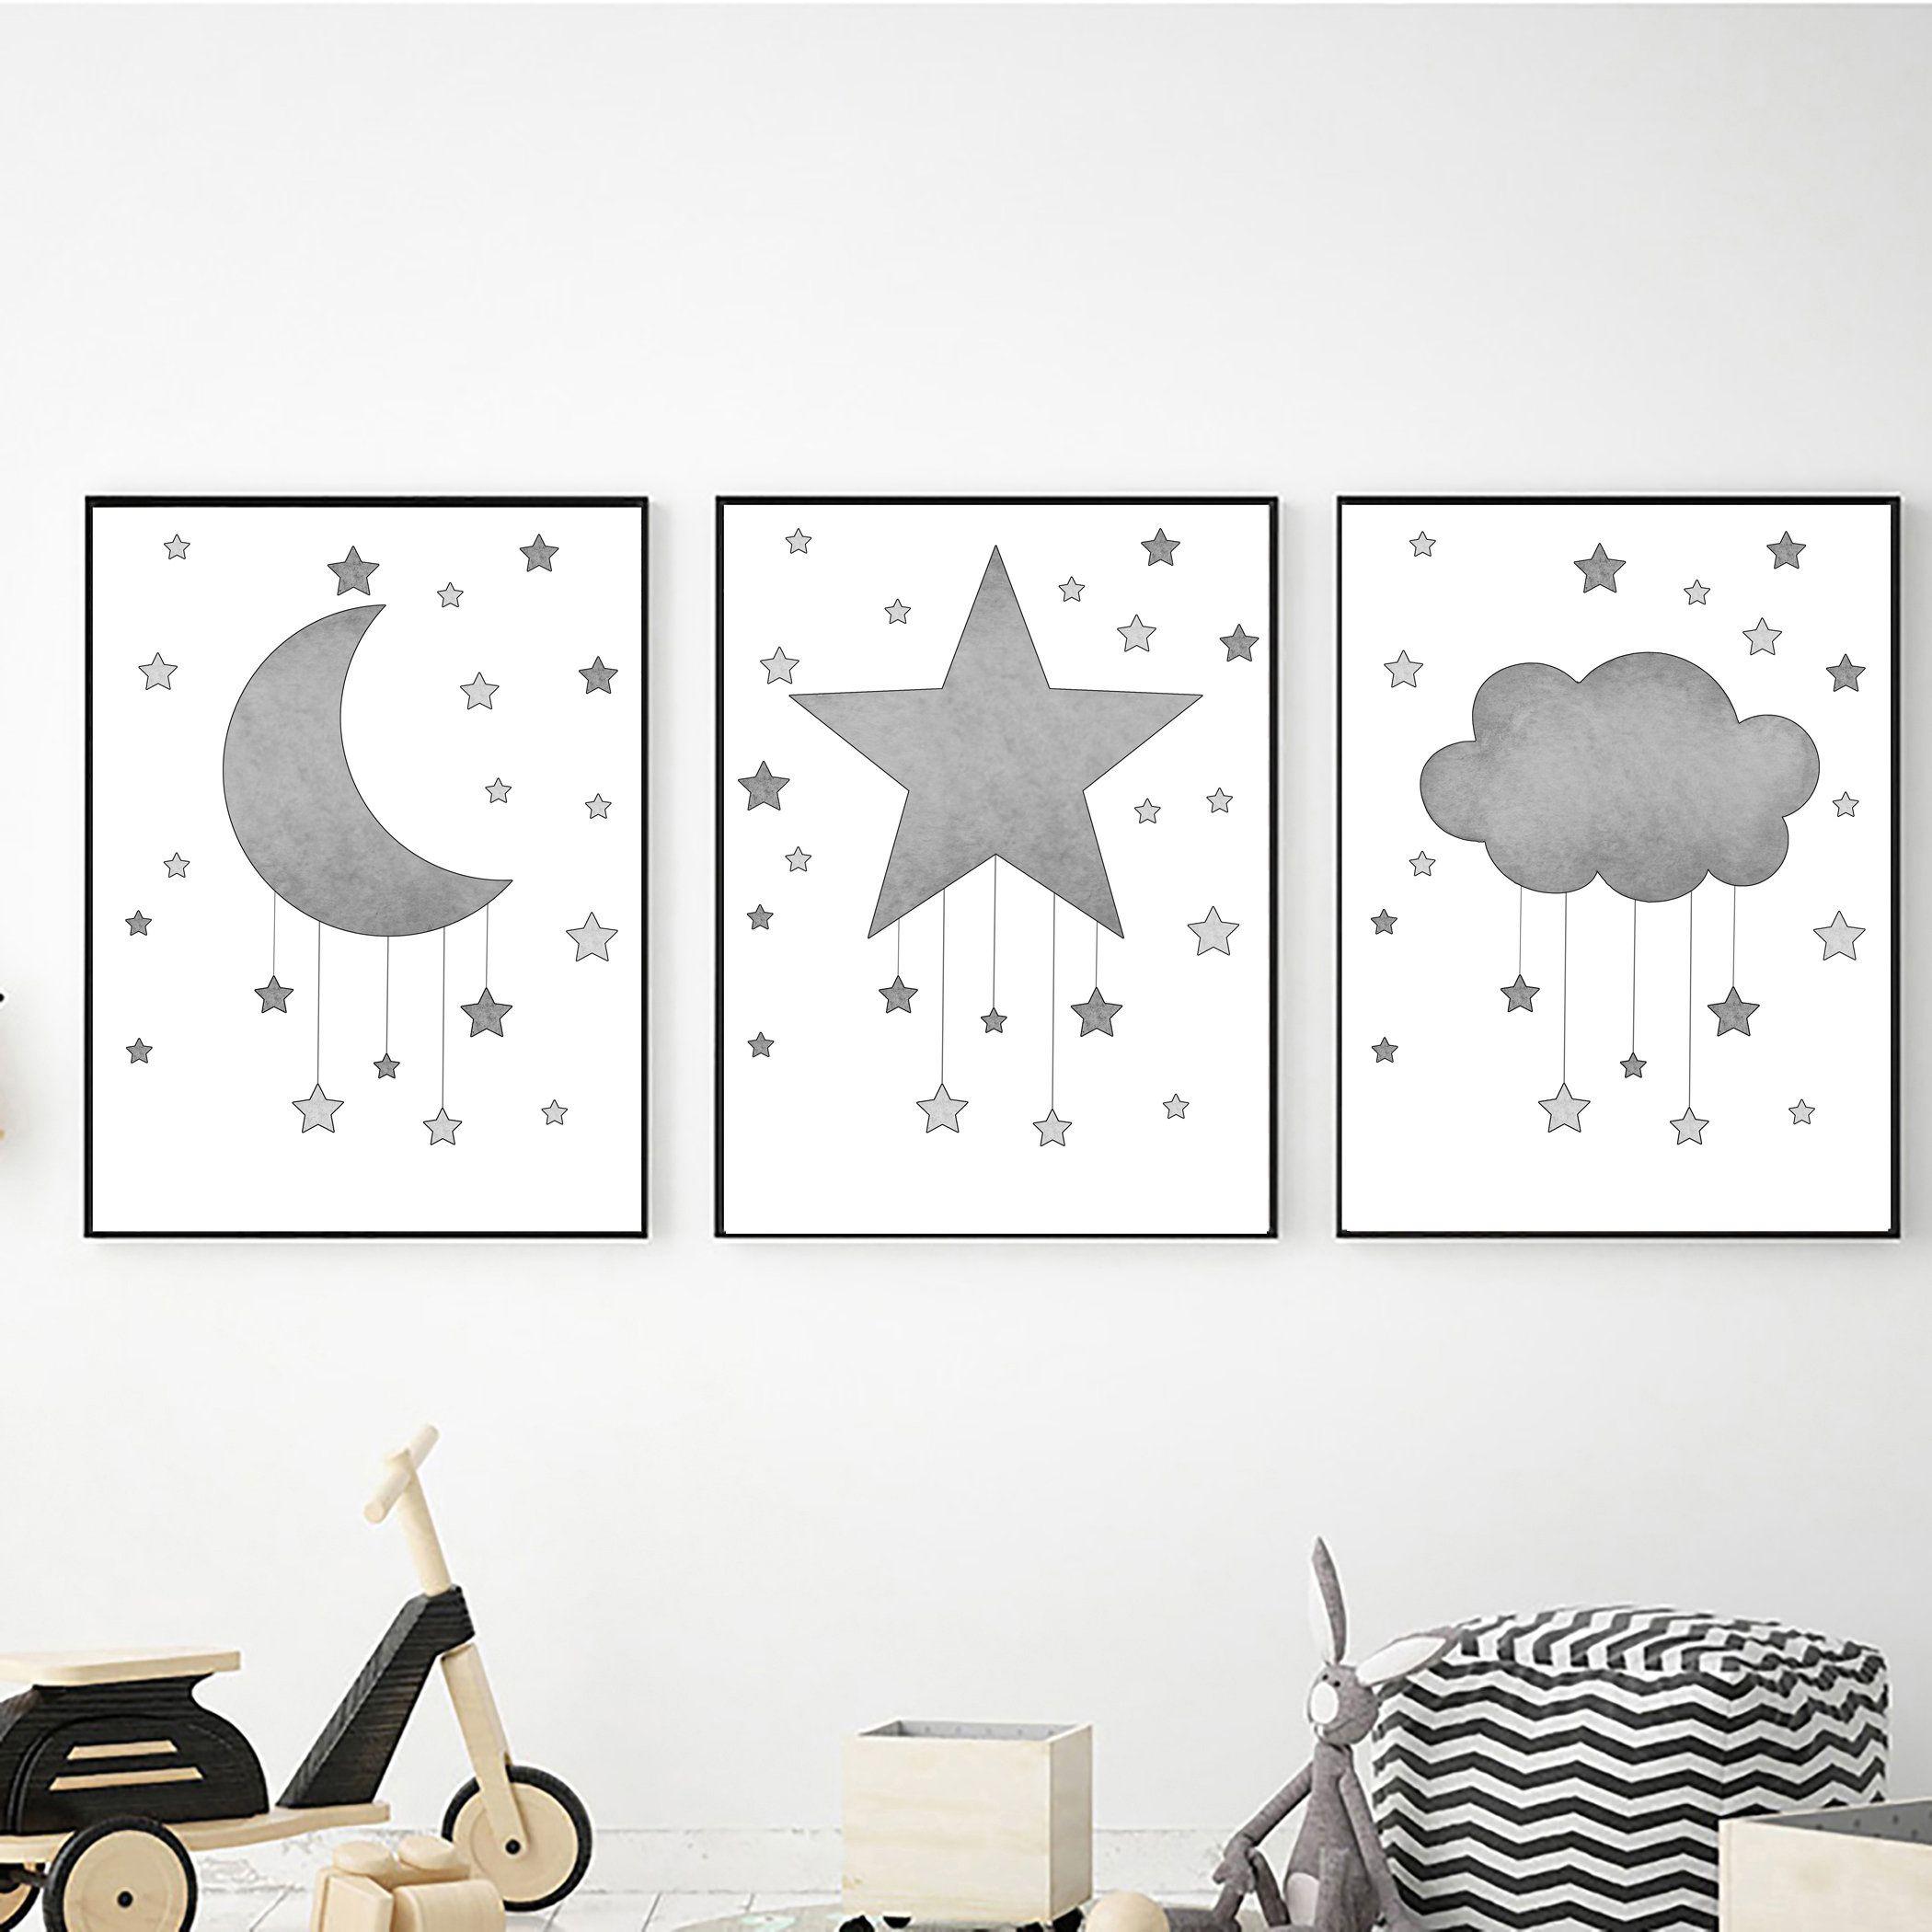 Nursery Printable Wall Art Grey And White Digital Download Etsy In 2020 Star Wall Art Moon Wall Art Wall Printables